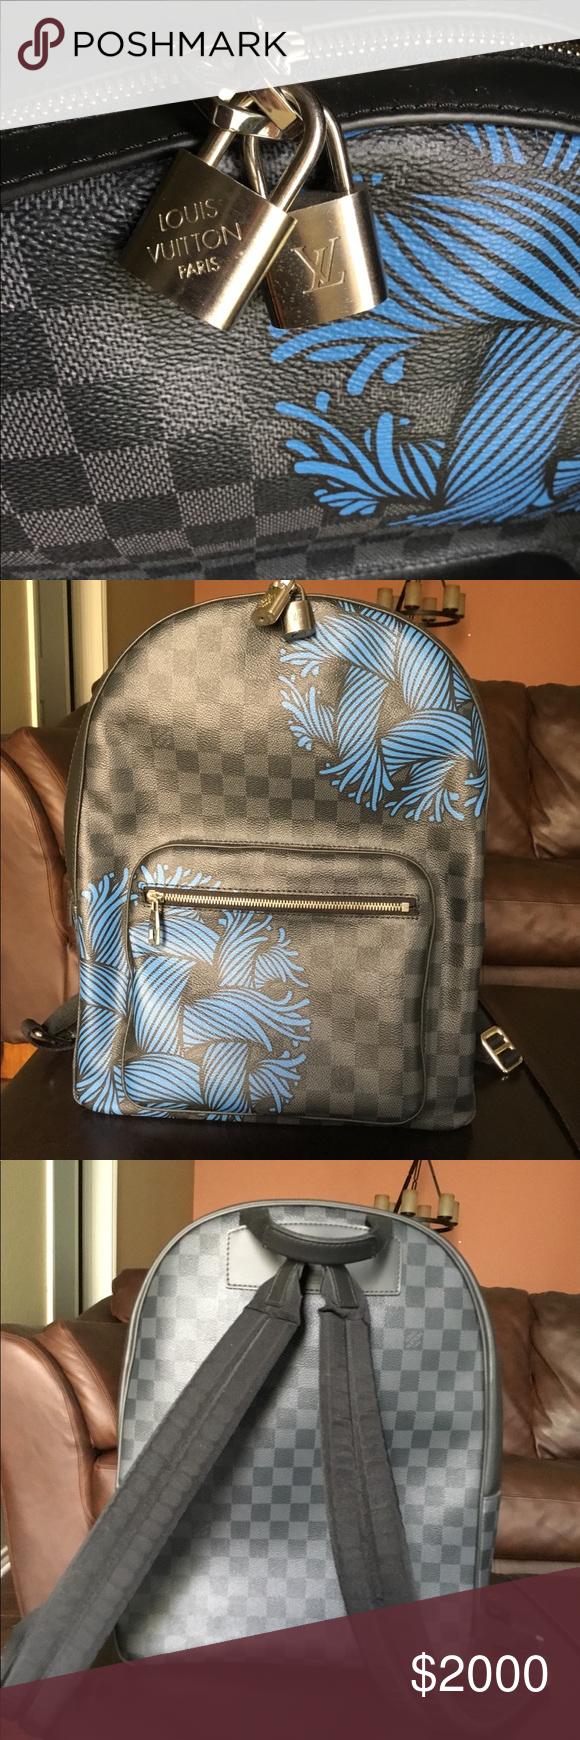 Louis Vuitton Men s Backpack Josh Damier Christopher Nemeth Rope Graphite  Black Blue Like new Carried twice Louis Vuitton Bags Backpacks ab275eaa3cf81